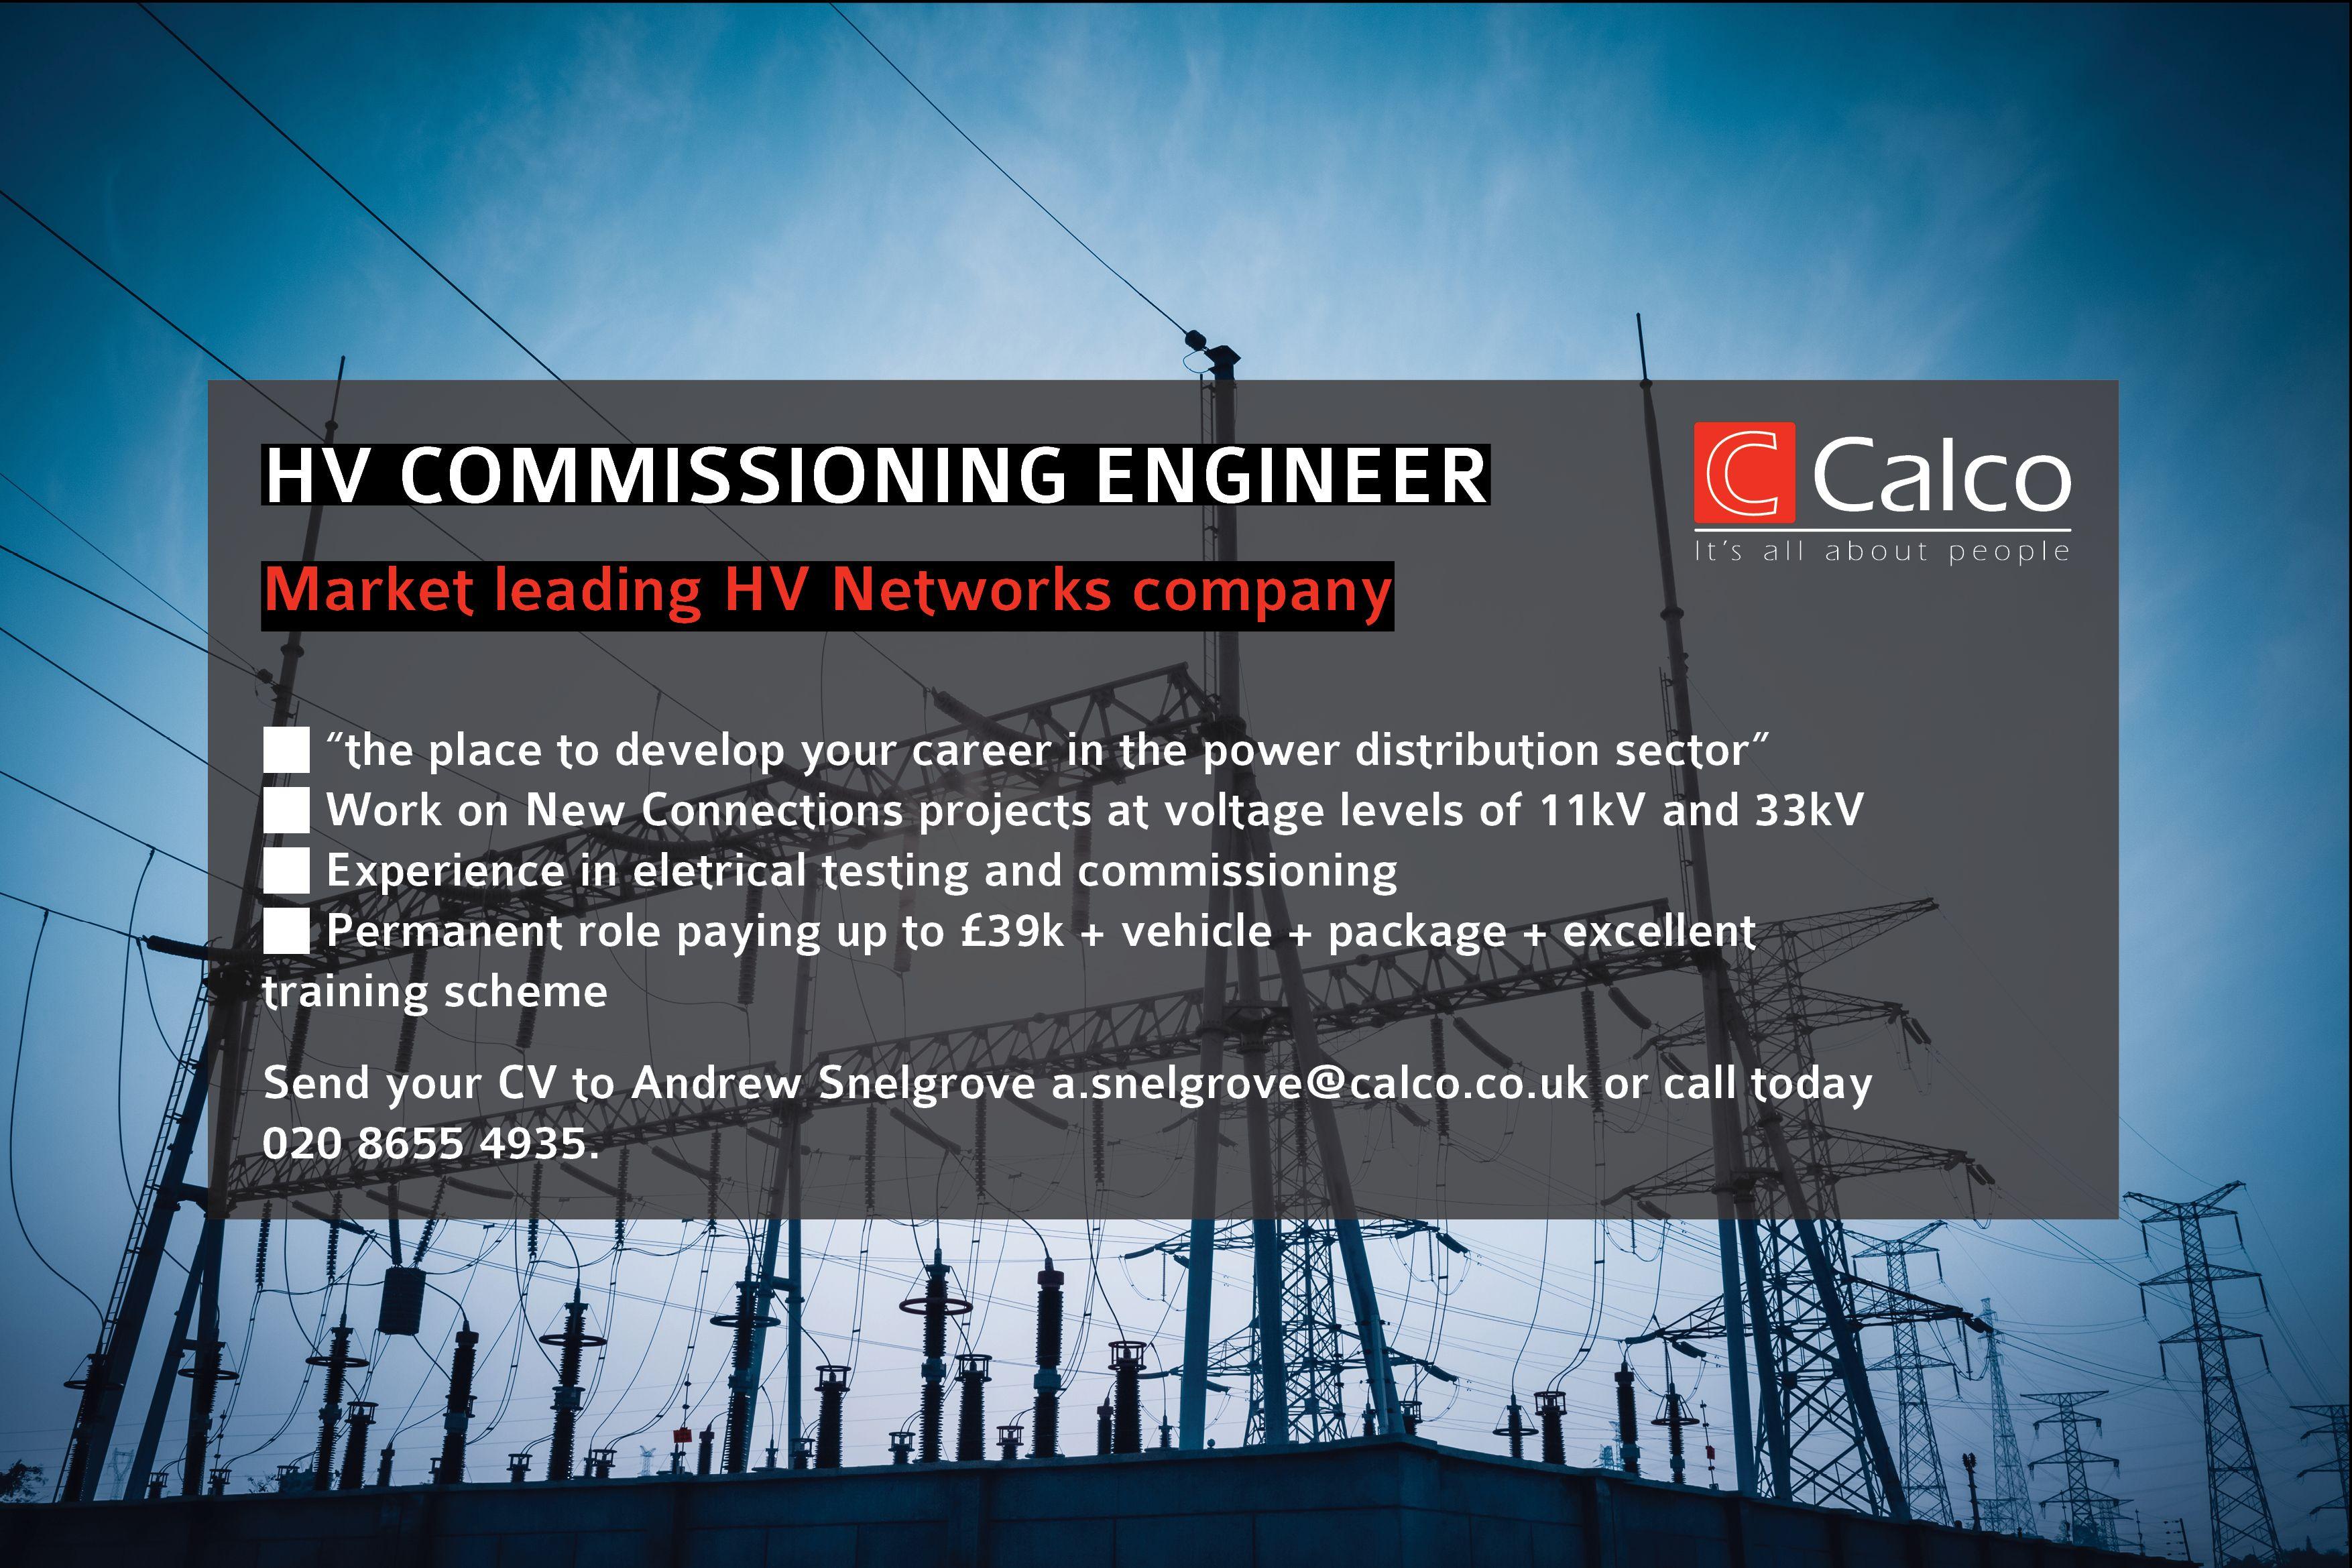 HV Commissioning Engineer CalcoRecruit Networking